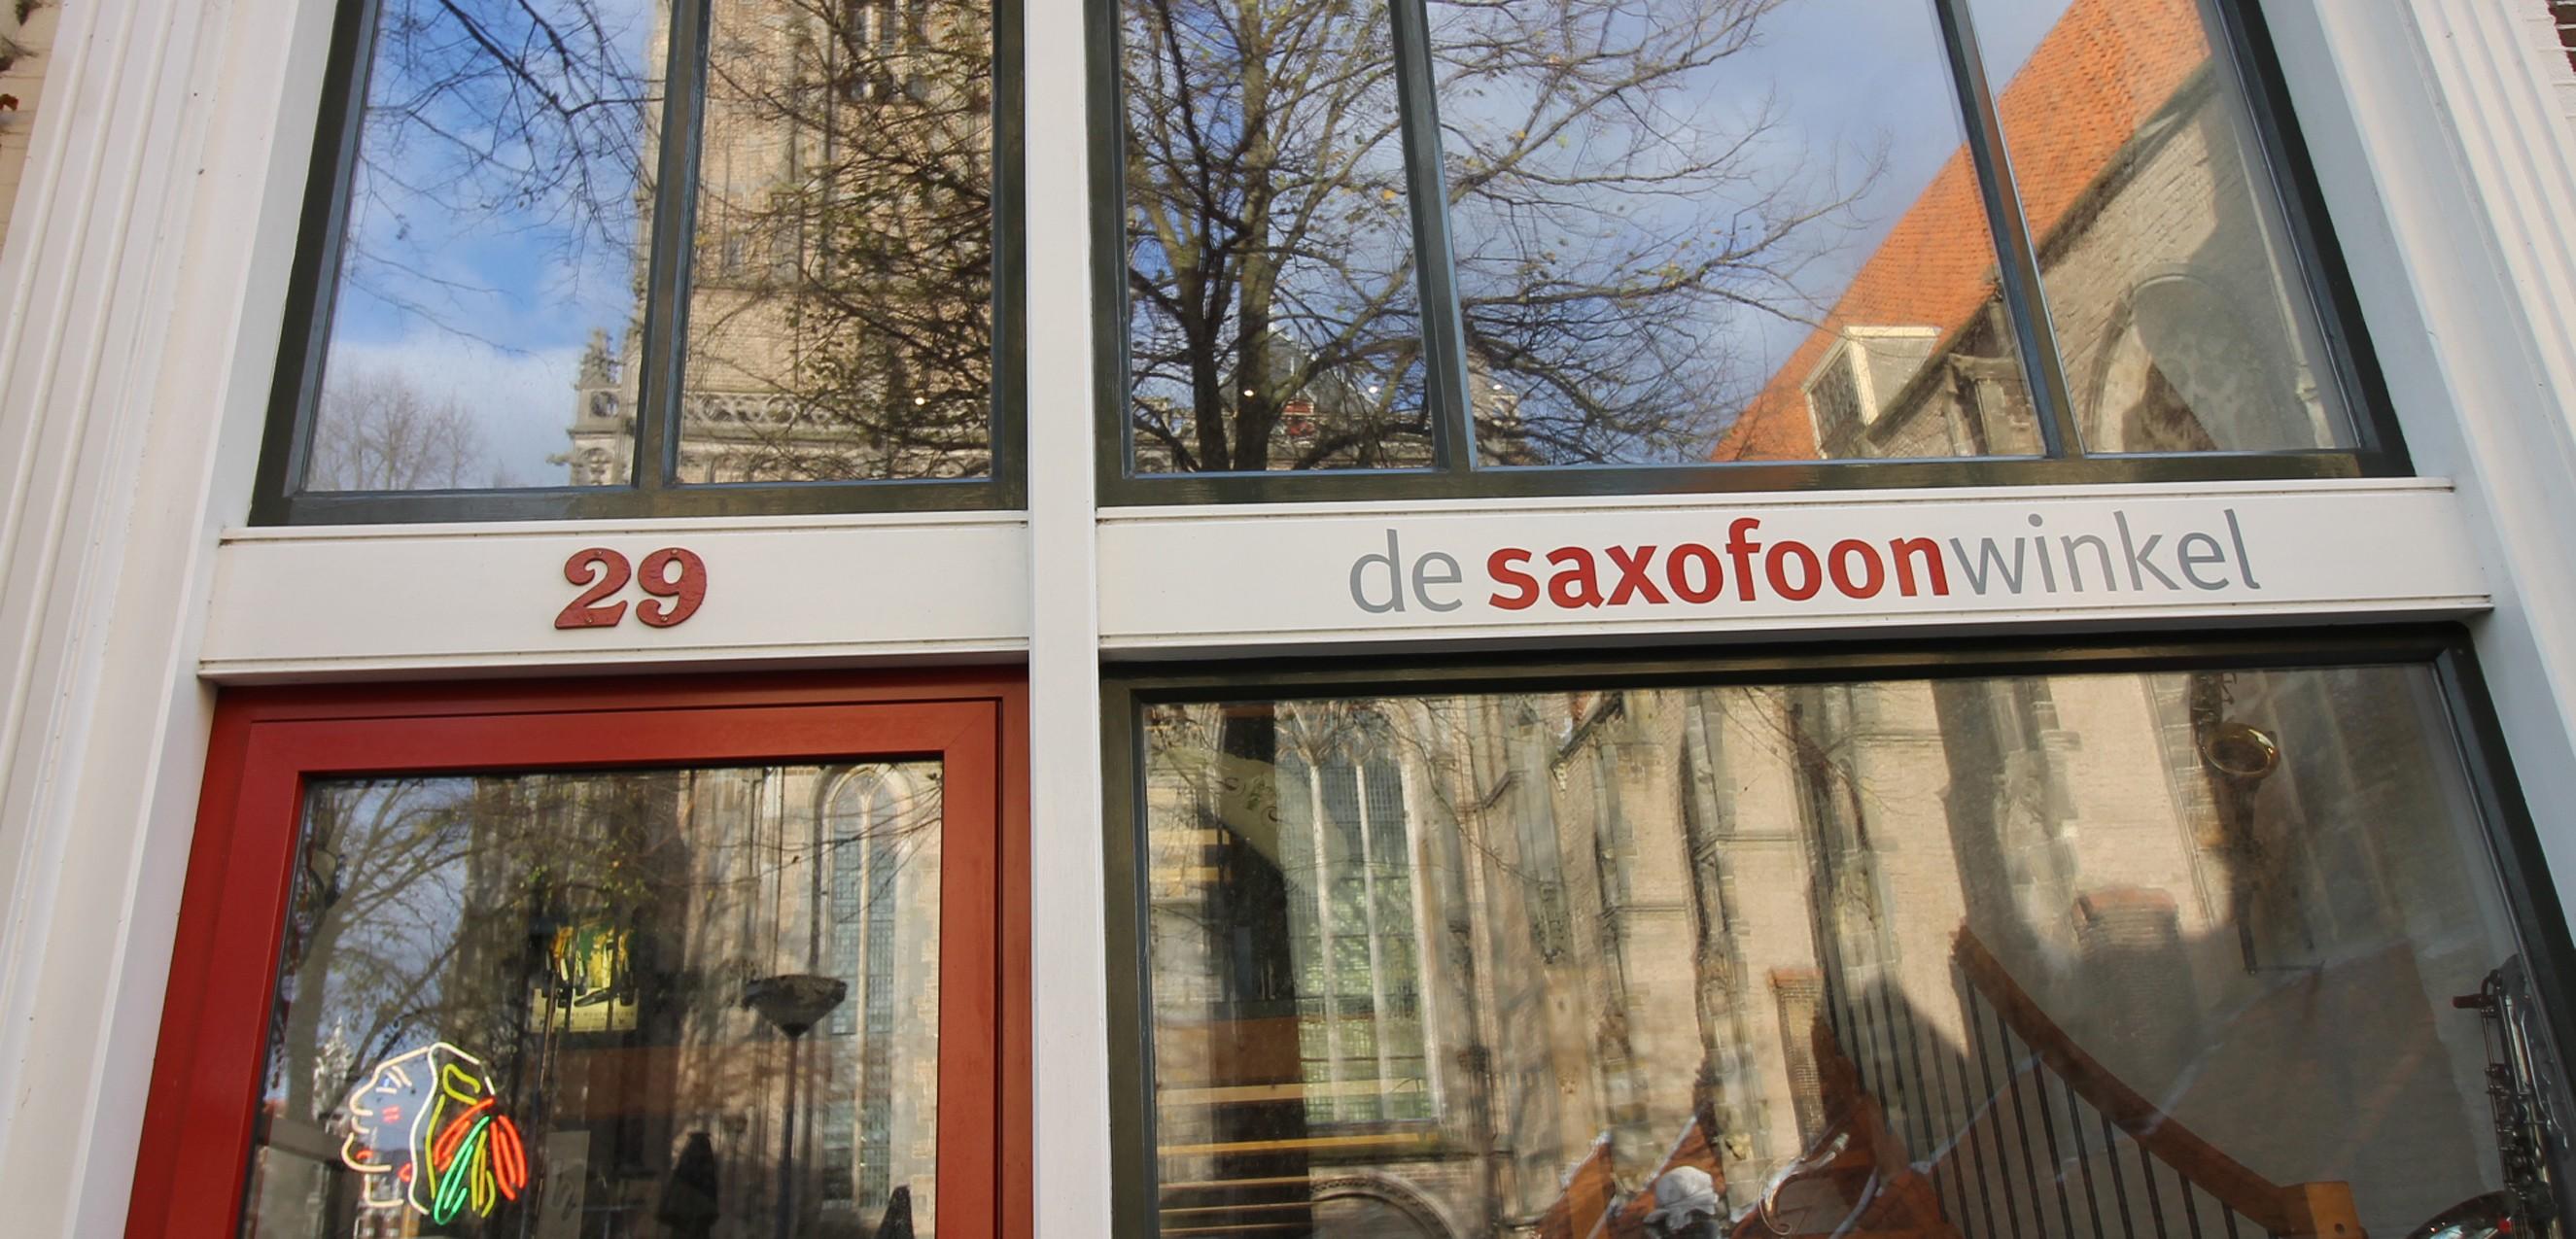 De Saxofoonwinkel Grote Kerkhof 29